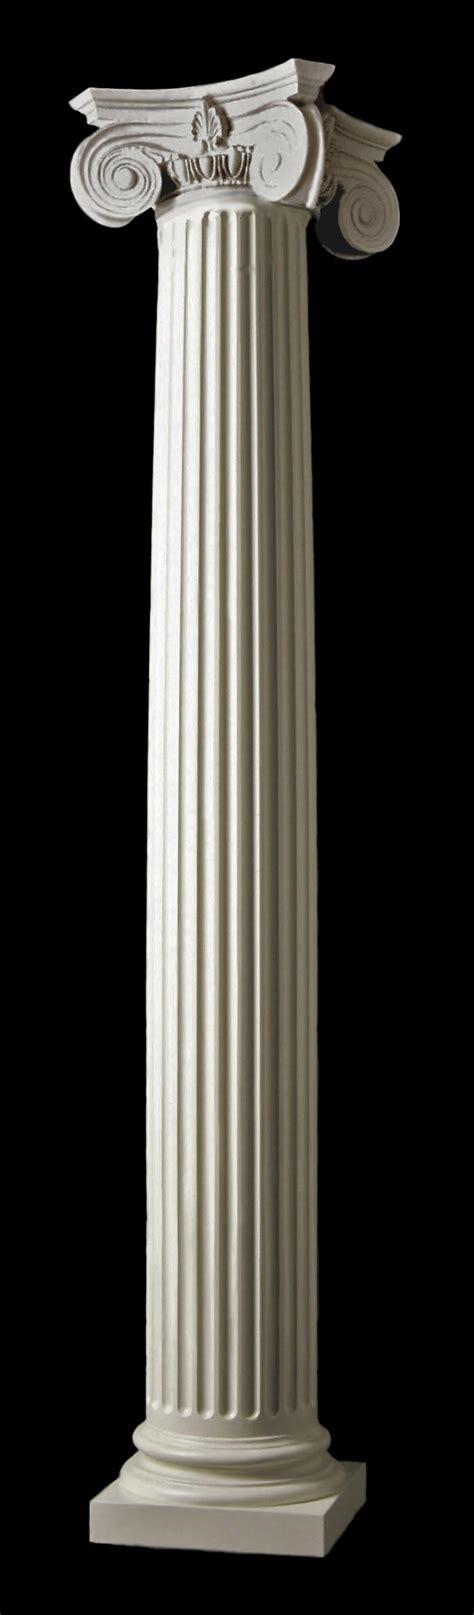 Column L by Empire Wood Columns Attic Base Chadsworth S 1 800 Columns